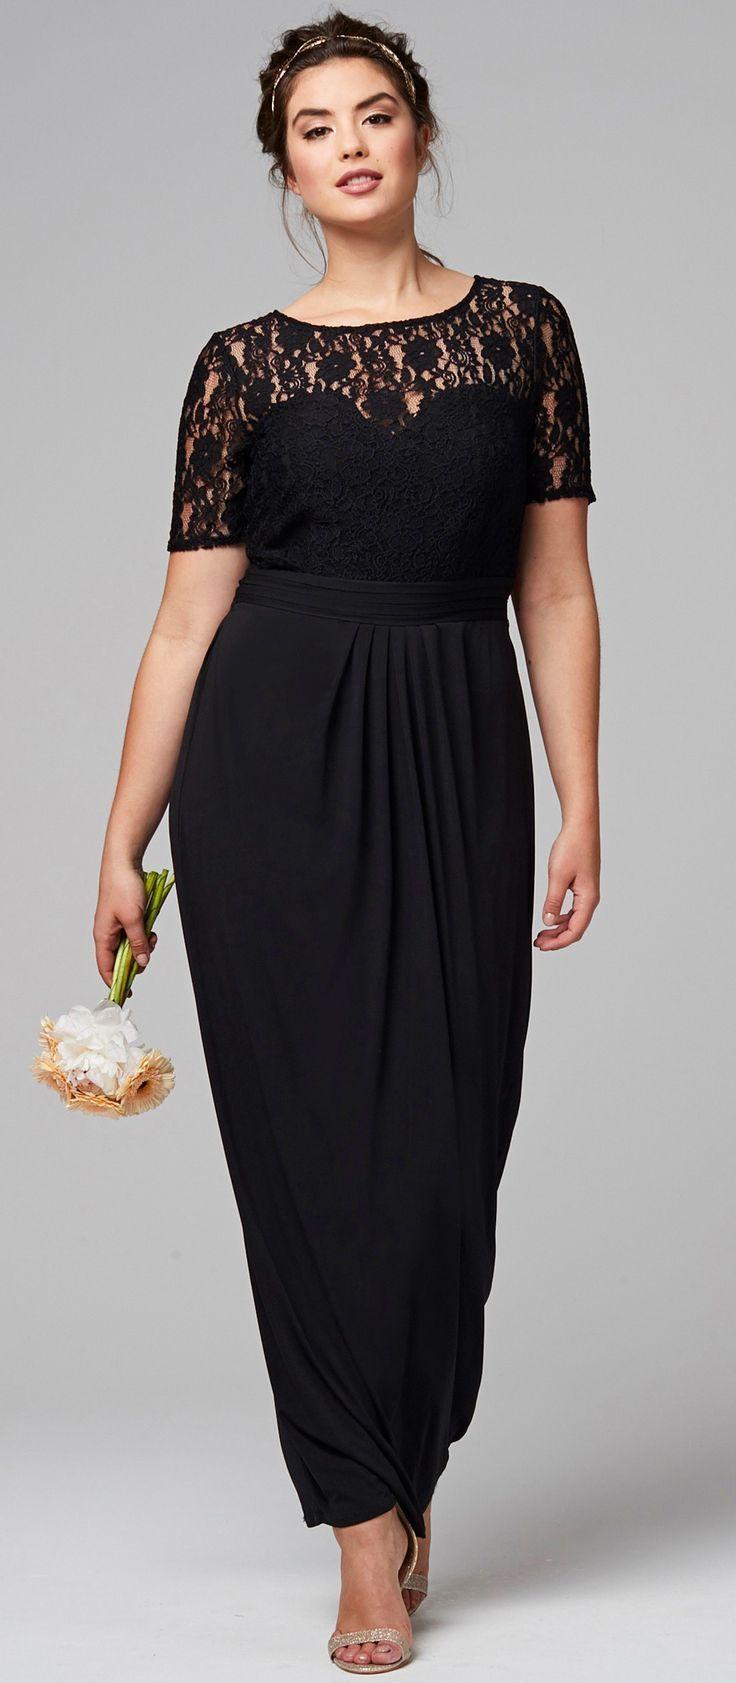 69272bc0420c 45 Plus Size Wedding Guest Dresses  with Sleeves  - Plus Size Cocktail  Dresses - alexawebb.com  Cocktaildresses